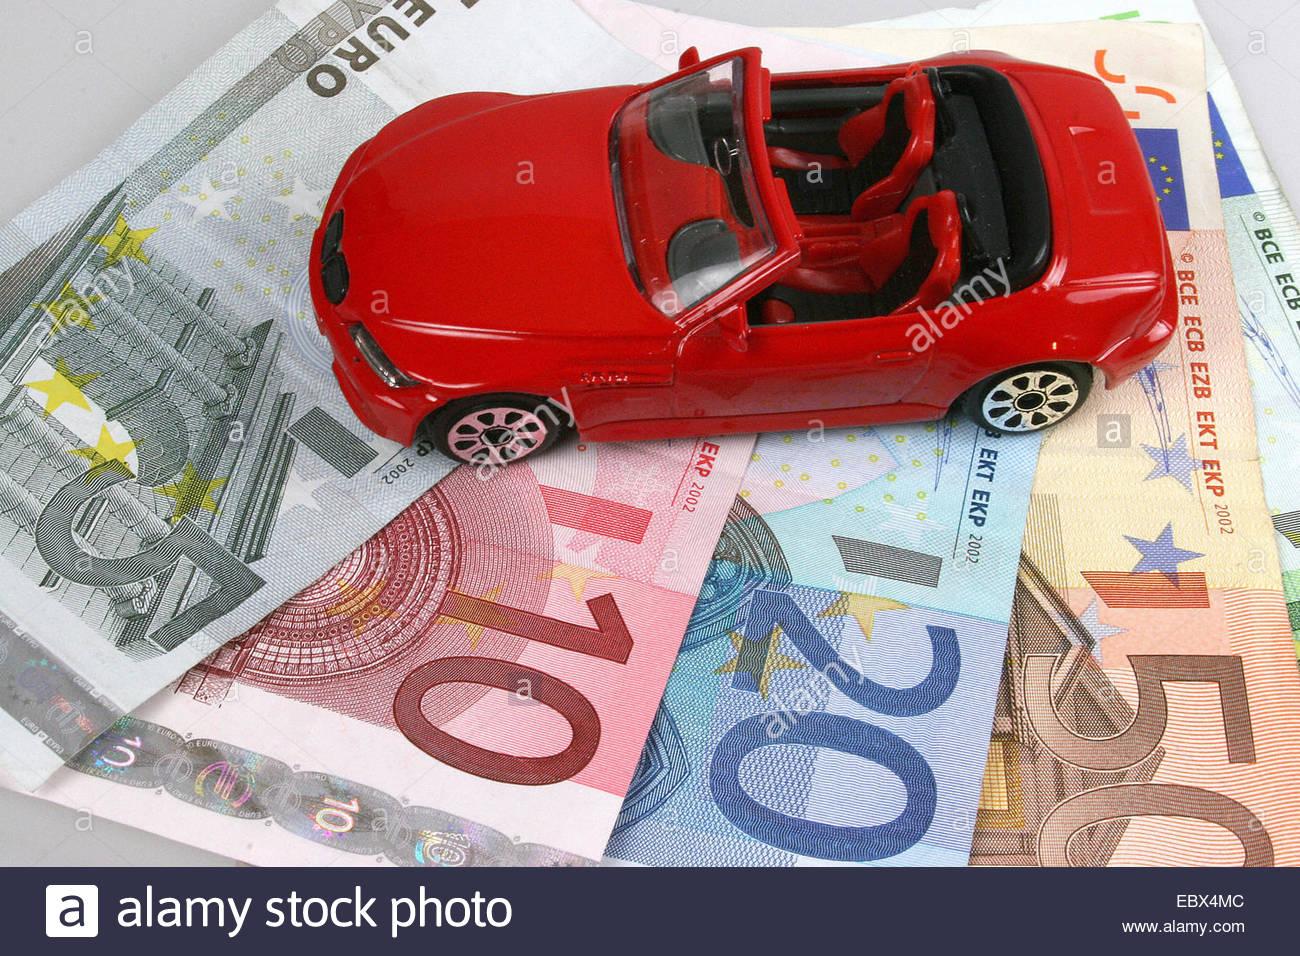 vehicle costs - Stock Image